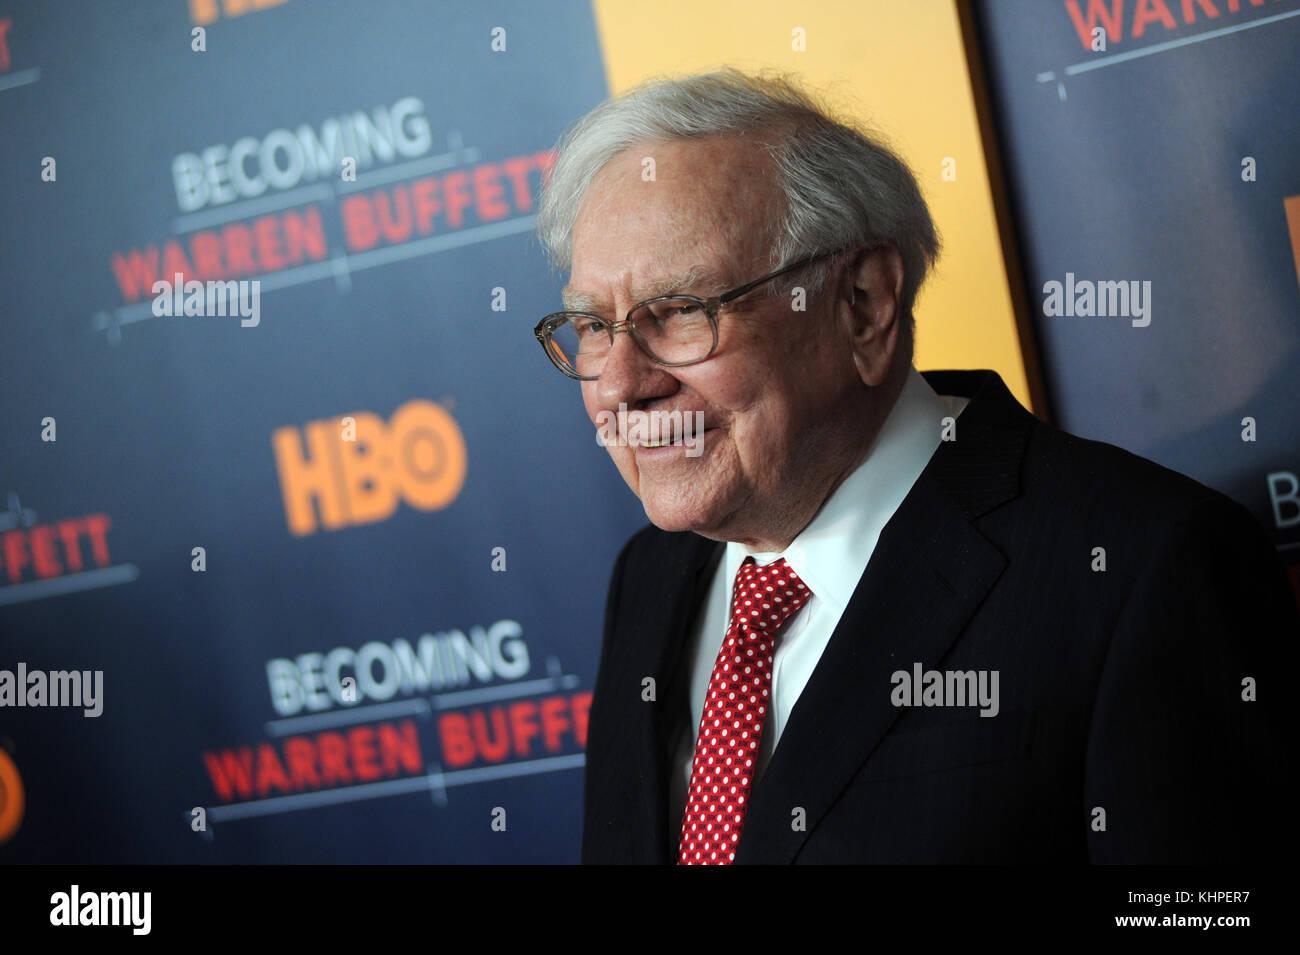 NEW YORK, NY - JANUARY 19: Warren Buffett attends the 'Becoming Warren Buffett' World Premiere at The Museum - Stock Image